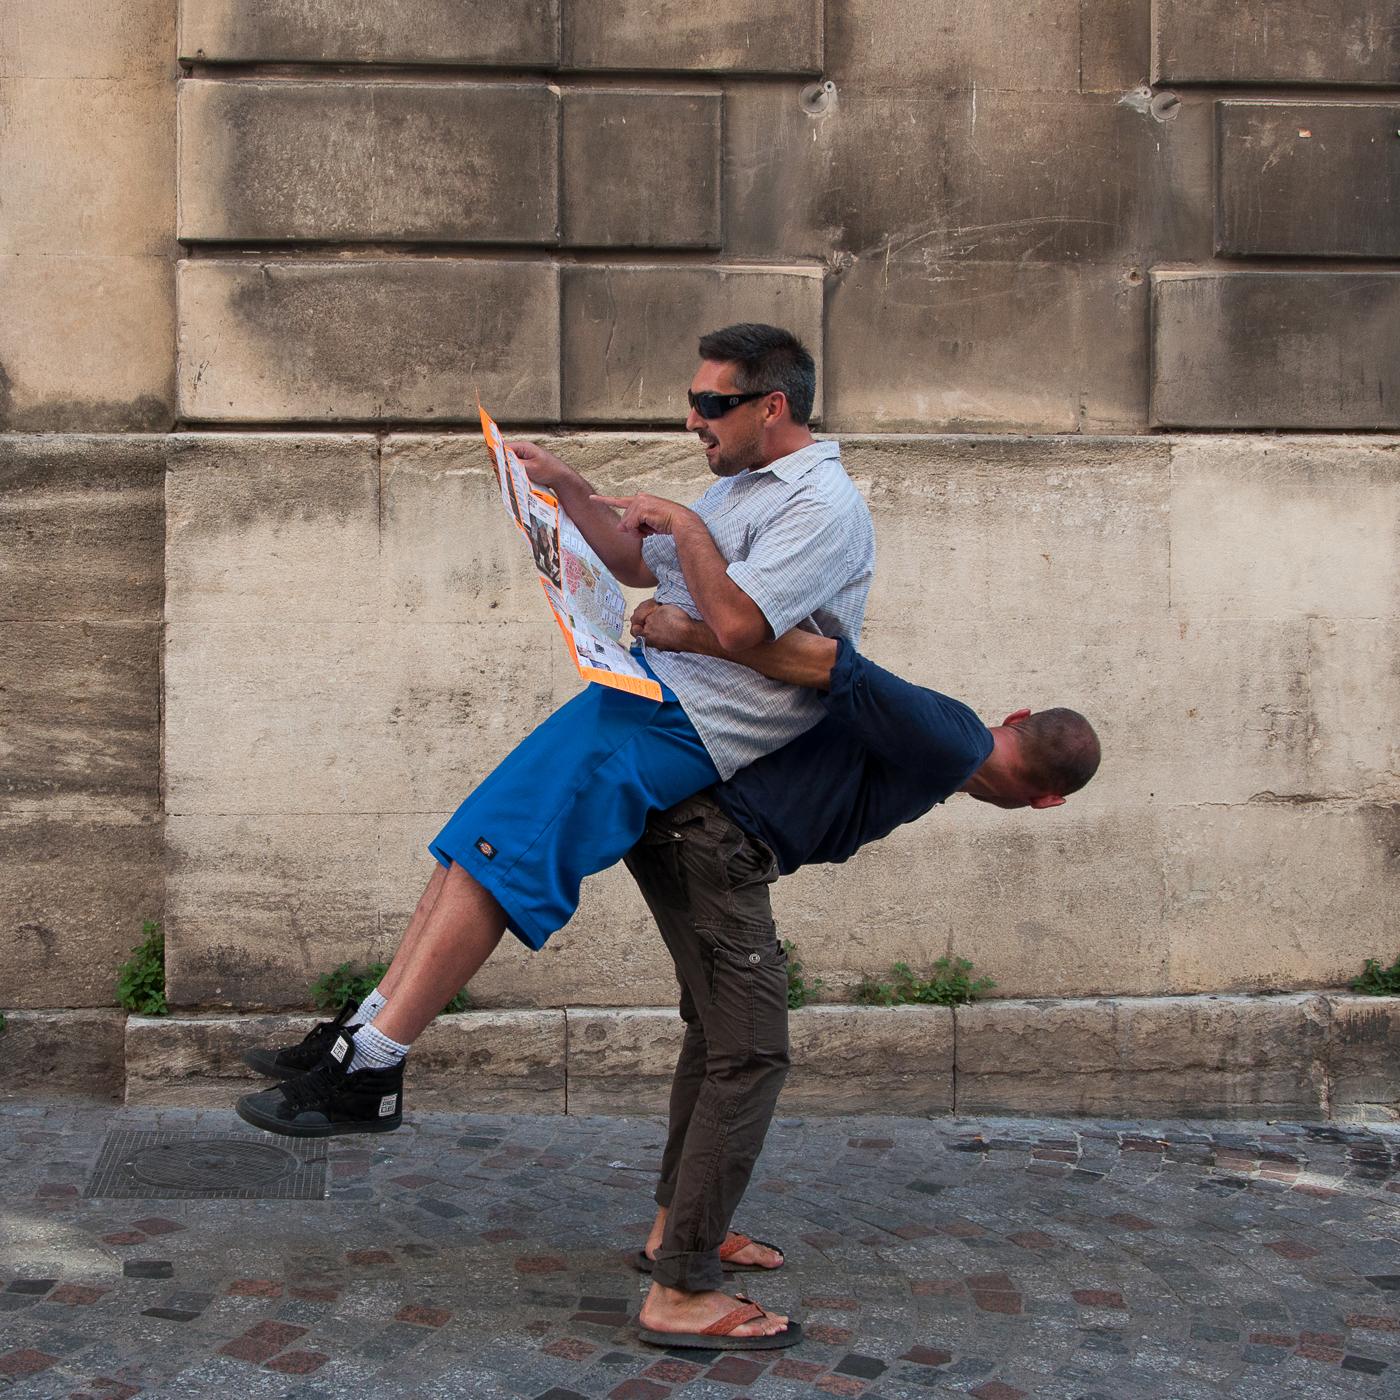 Arles 2015 - Le plan